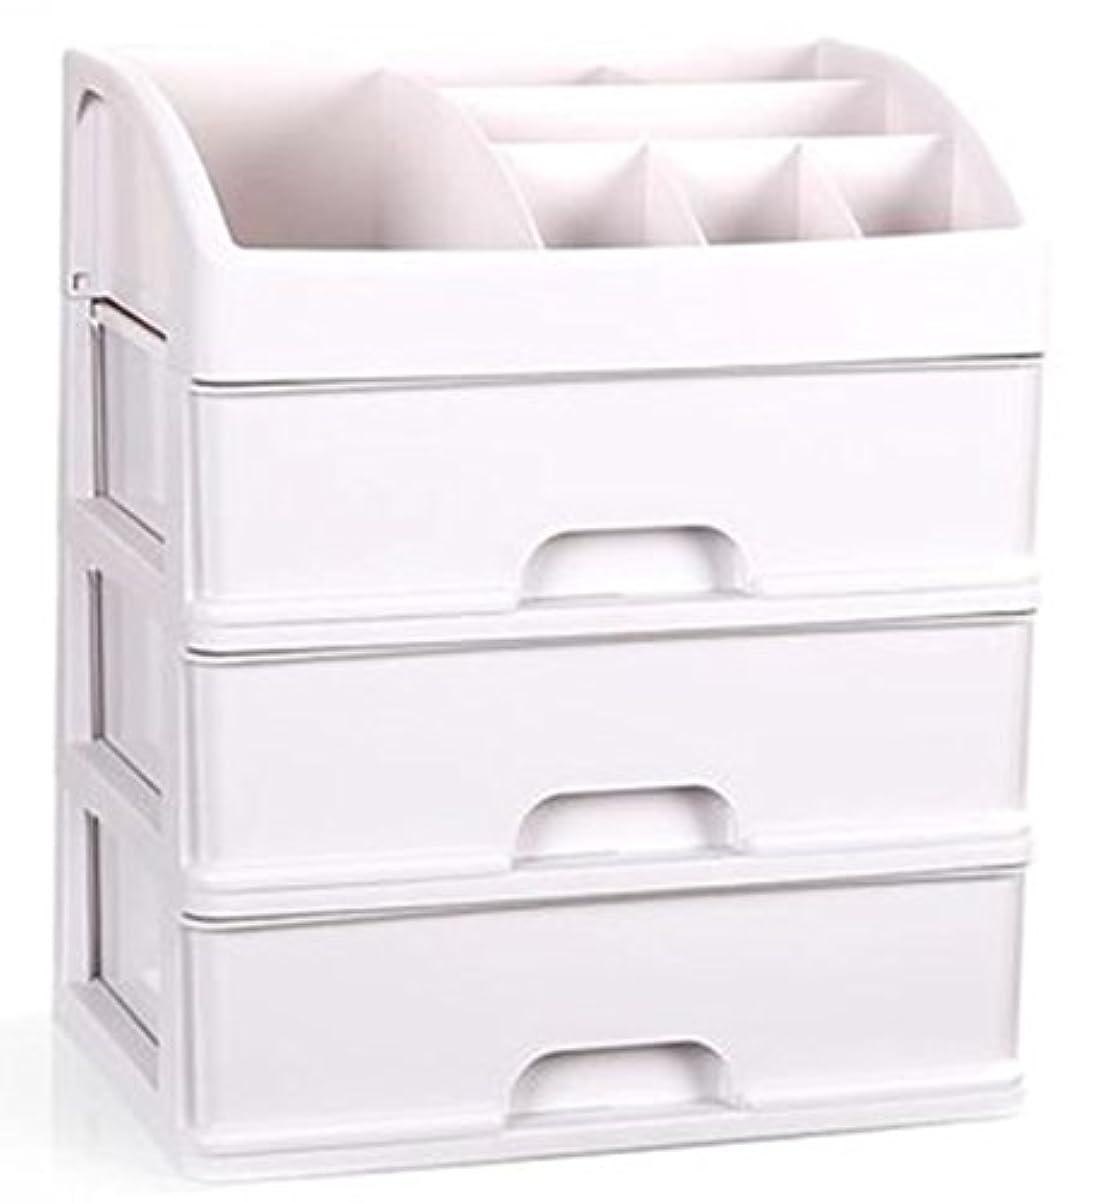 ZUOMAメークボックス 化粧品収納ボックス コスメスタンド 引き出し式 メークケース 小物/化粧品入れ コスメ収納 透明アクリル 大容量 (ホワイト34*25*40CM(3層))